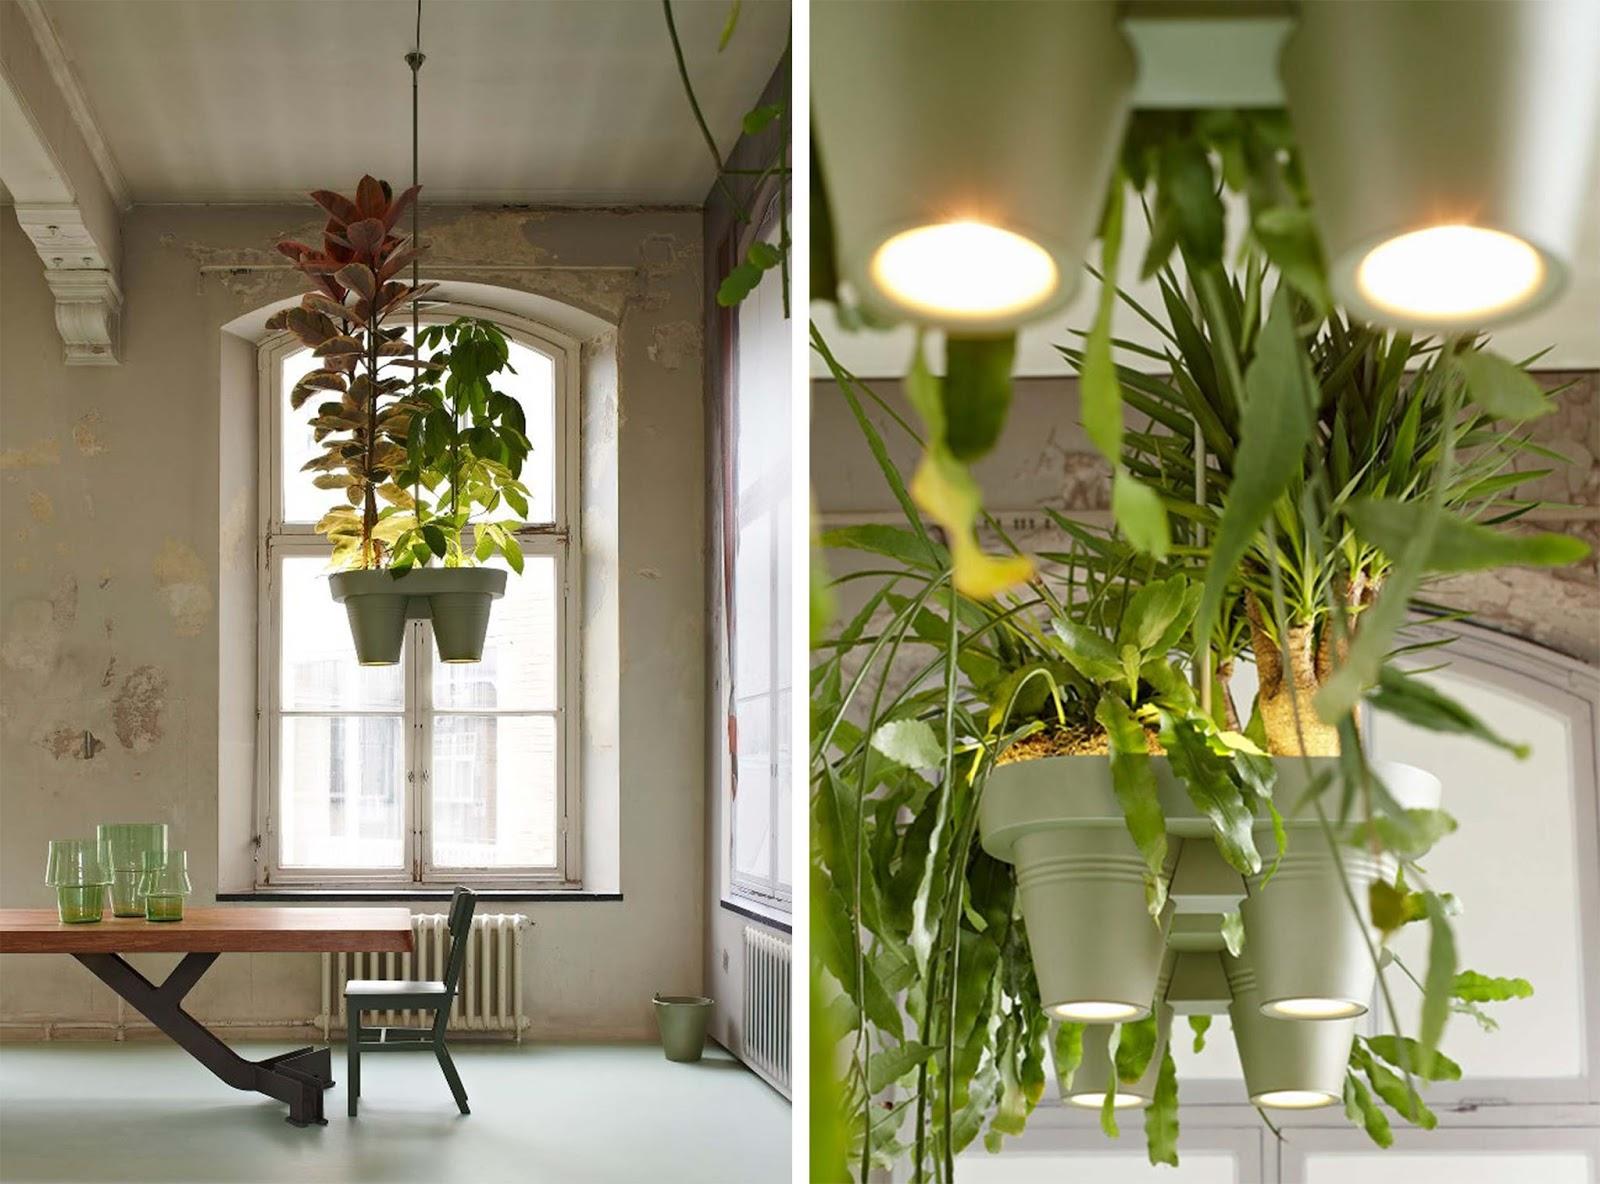 Roderick vos progetta vasi sospesi con illuminazione e for Vasi sospesi